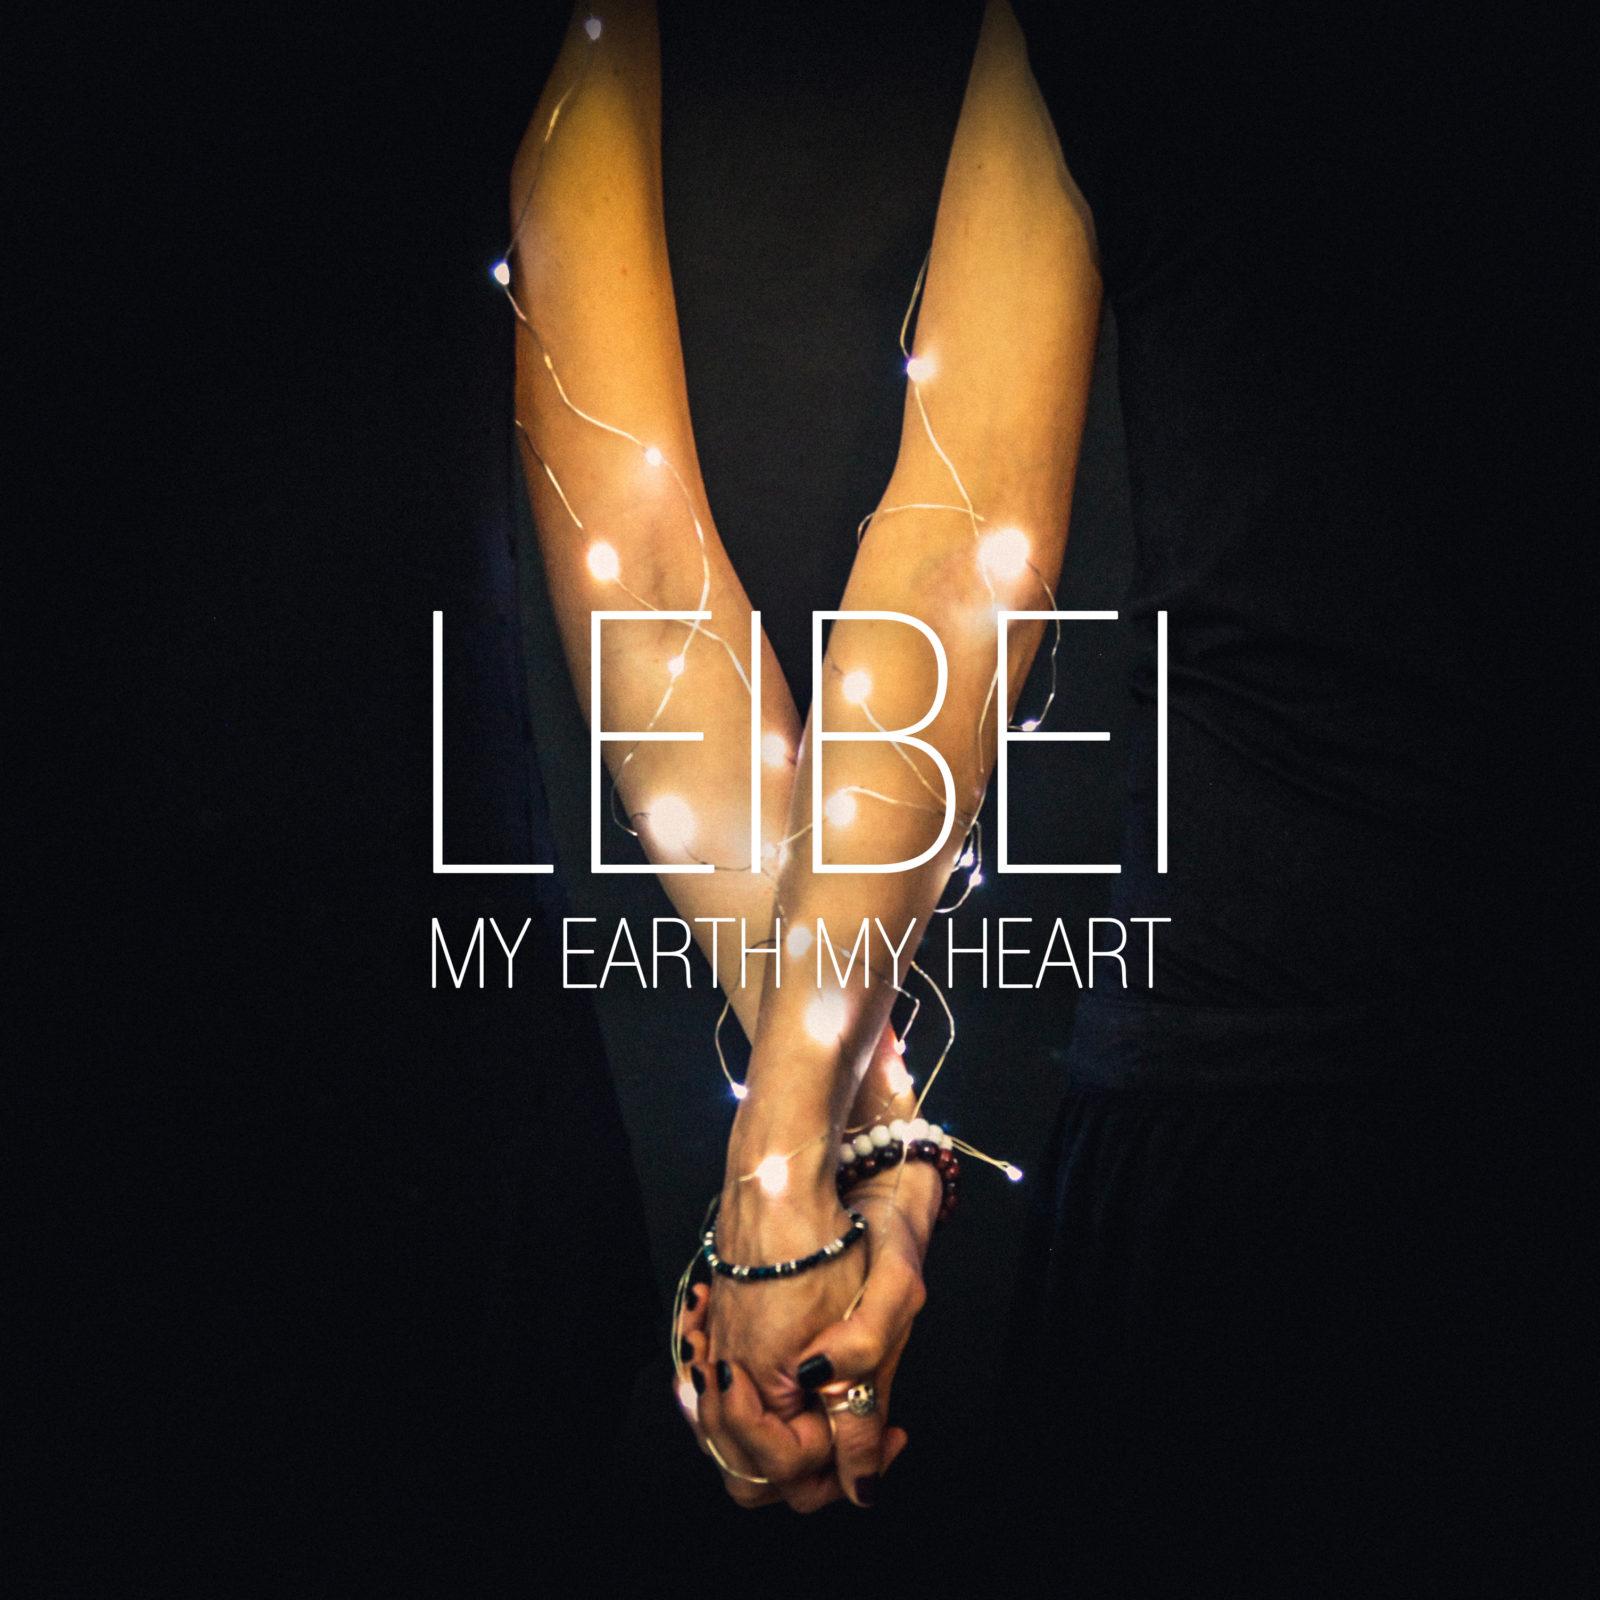 leibei my heart my heart cover